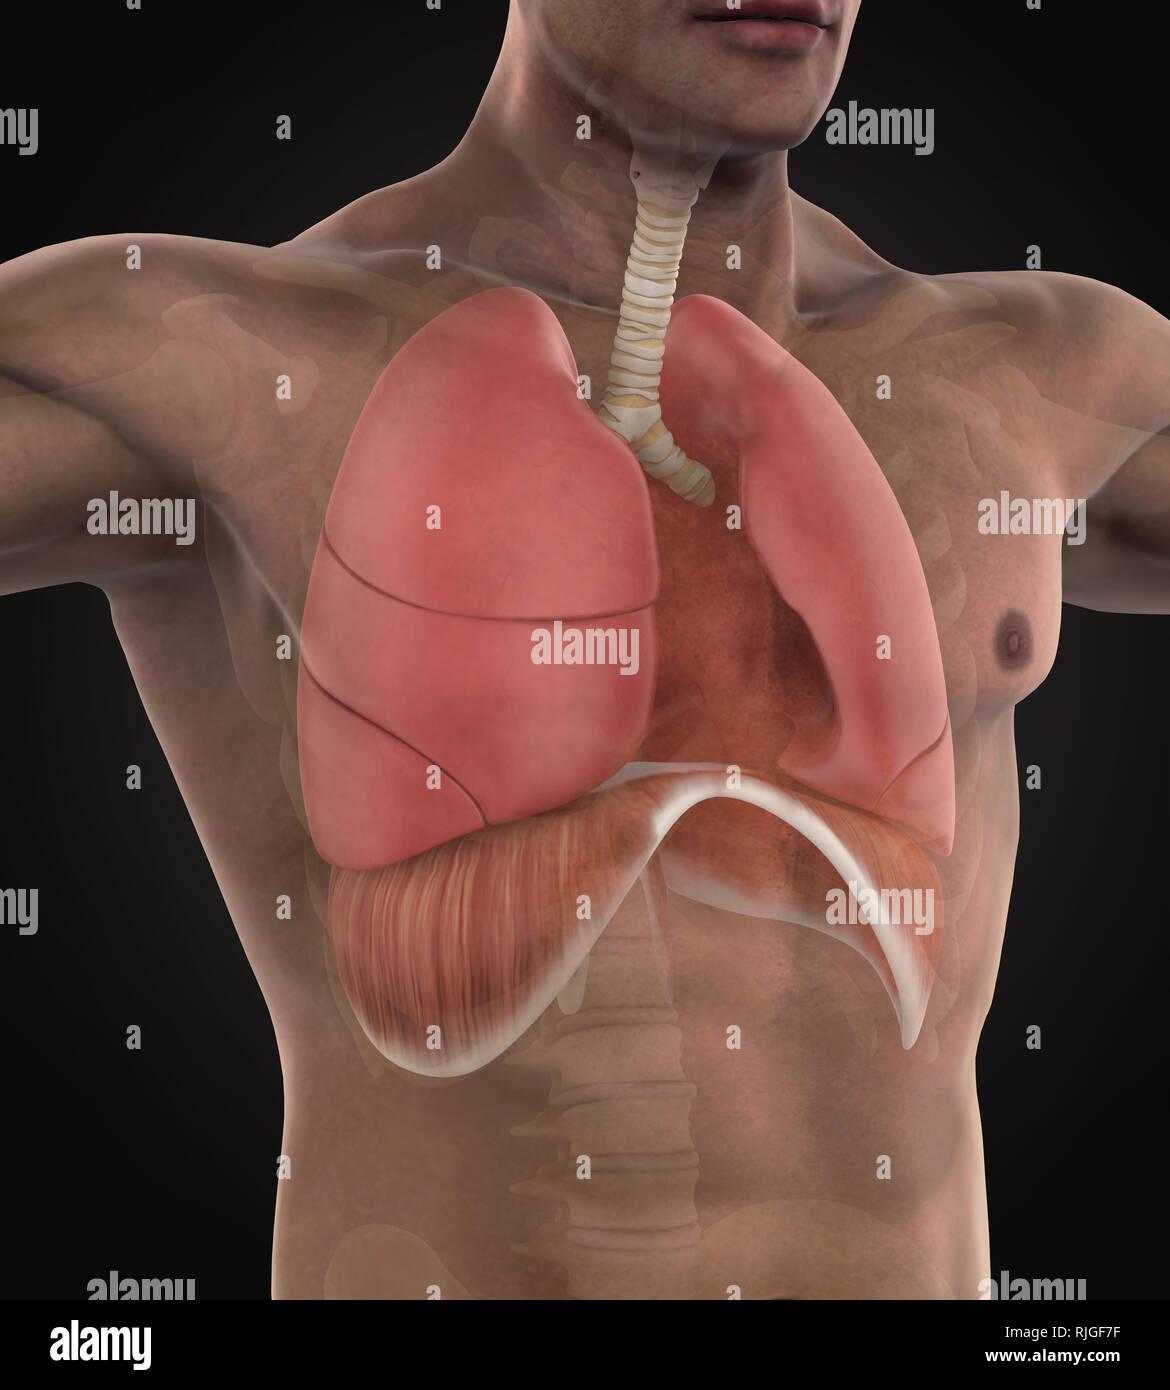 Human Respiratory System Illustration - Stock Image